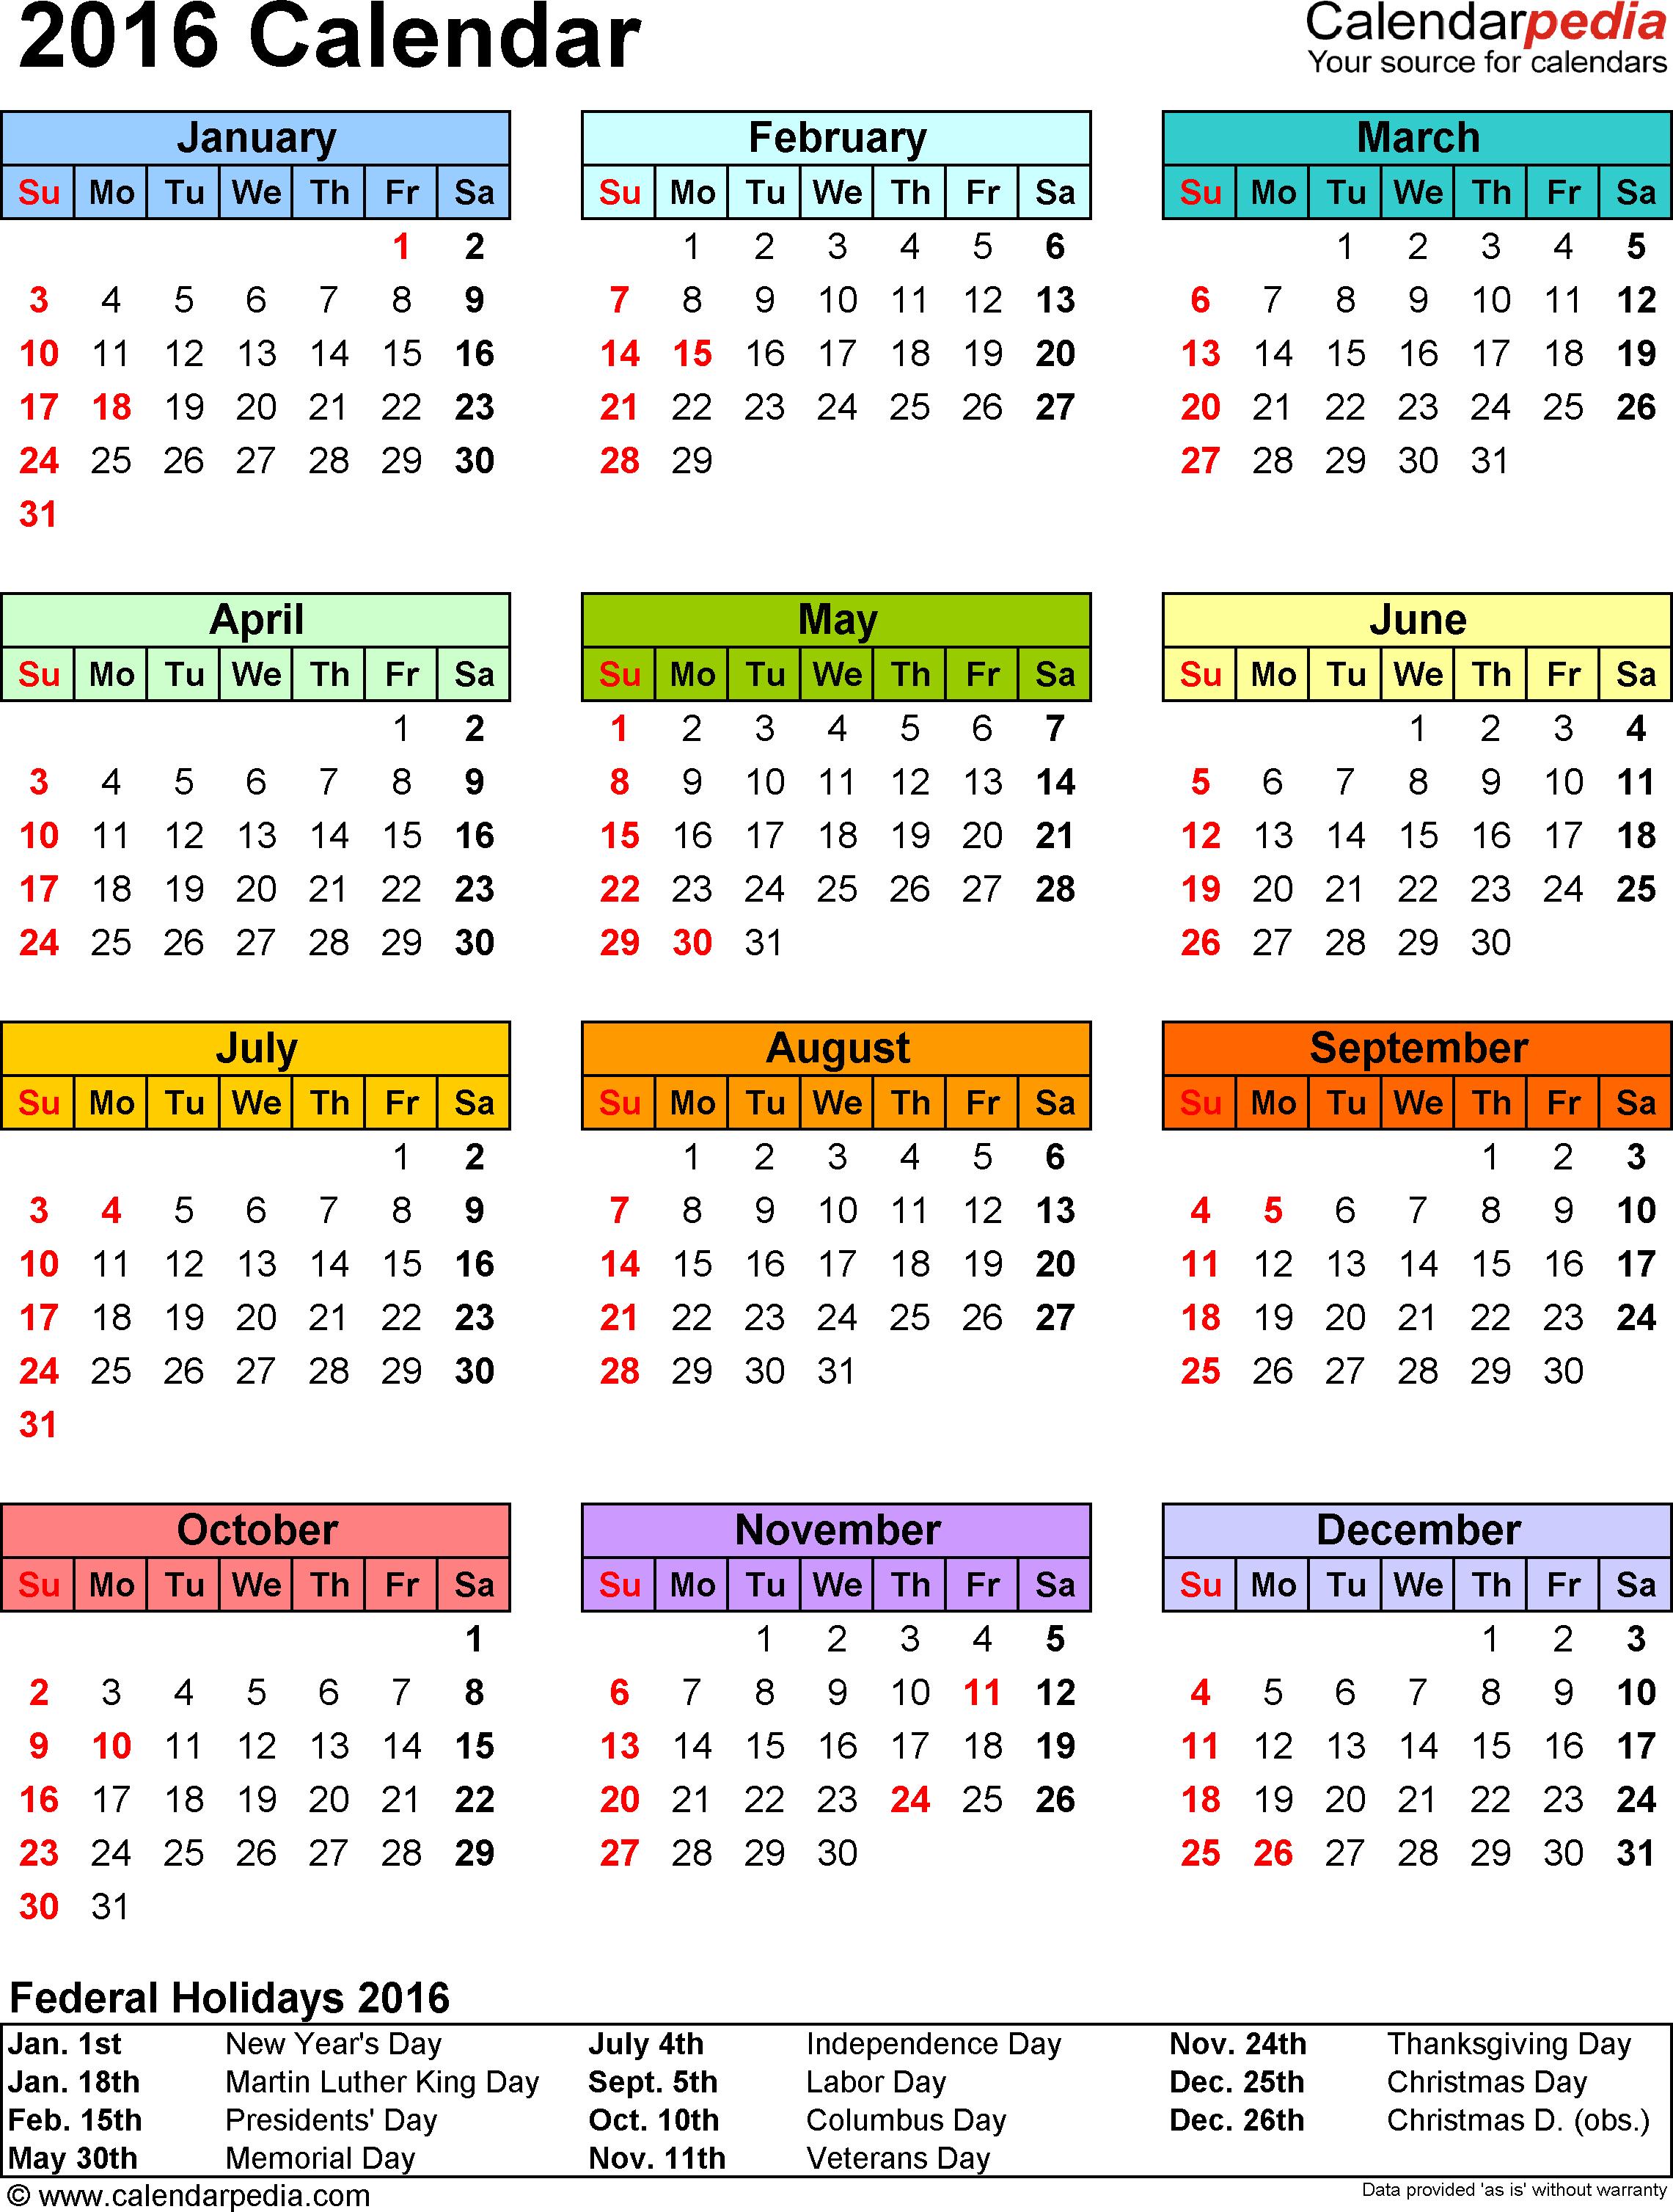 Miami Calendar Of Events August 2015 Fyi Miami August 17 2017 Miami Today Year 2016 Calendar New Calendar Template Site